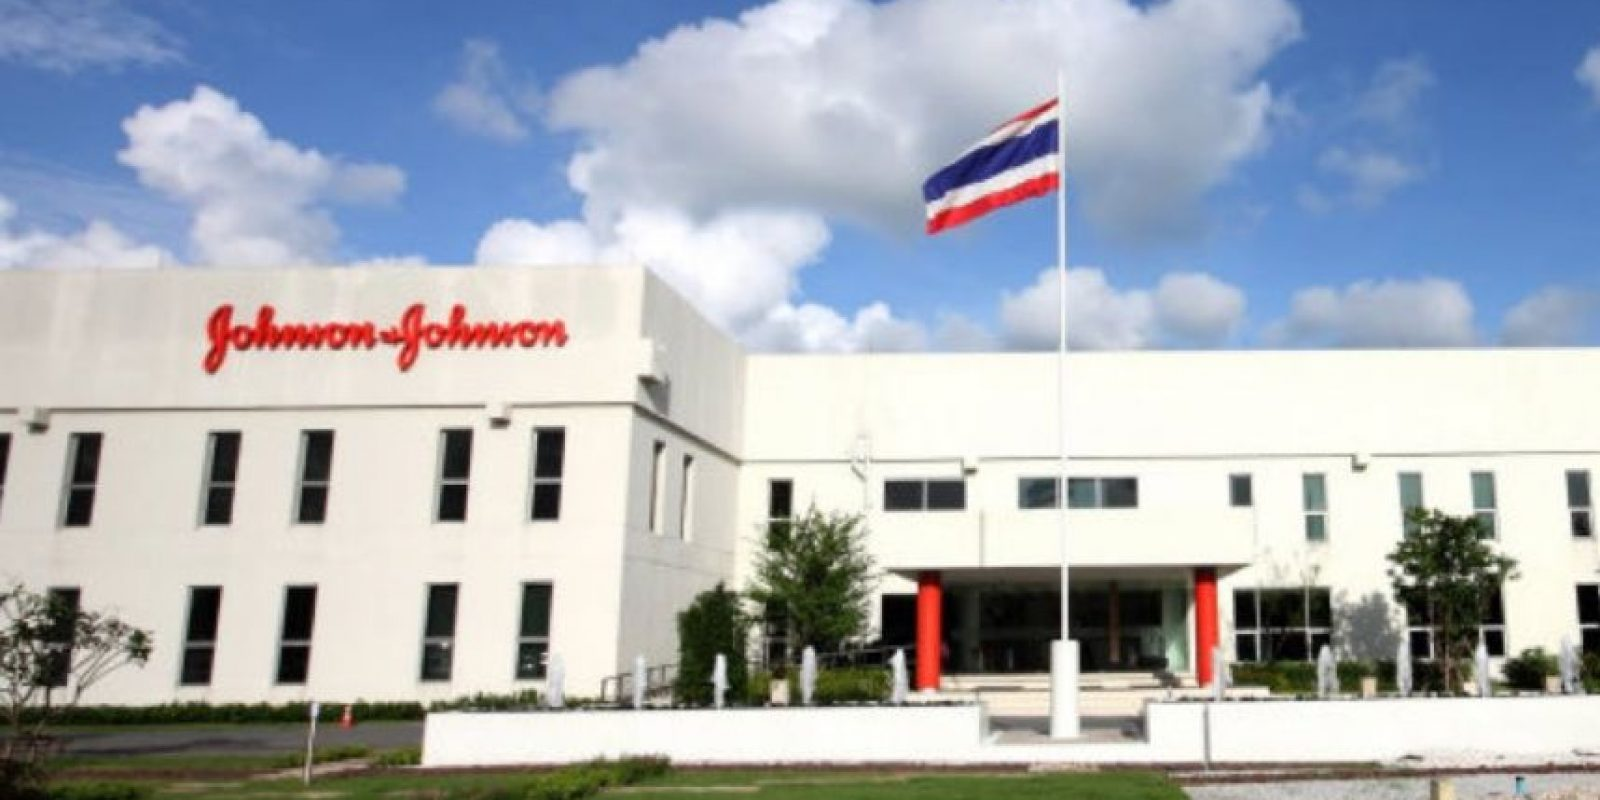 Johnson & Johnson Foto:healthcareglobal.com